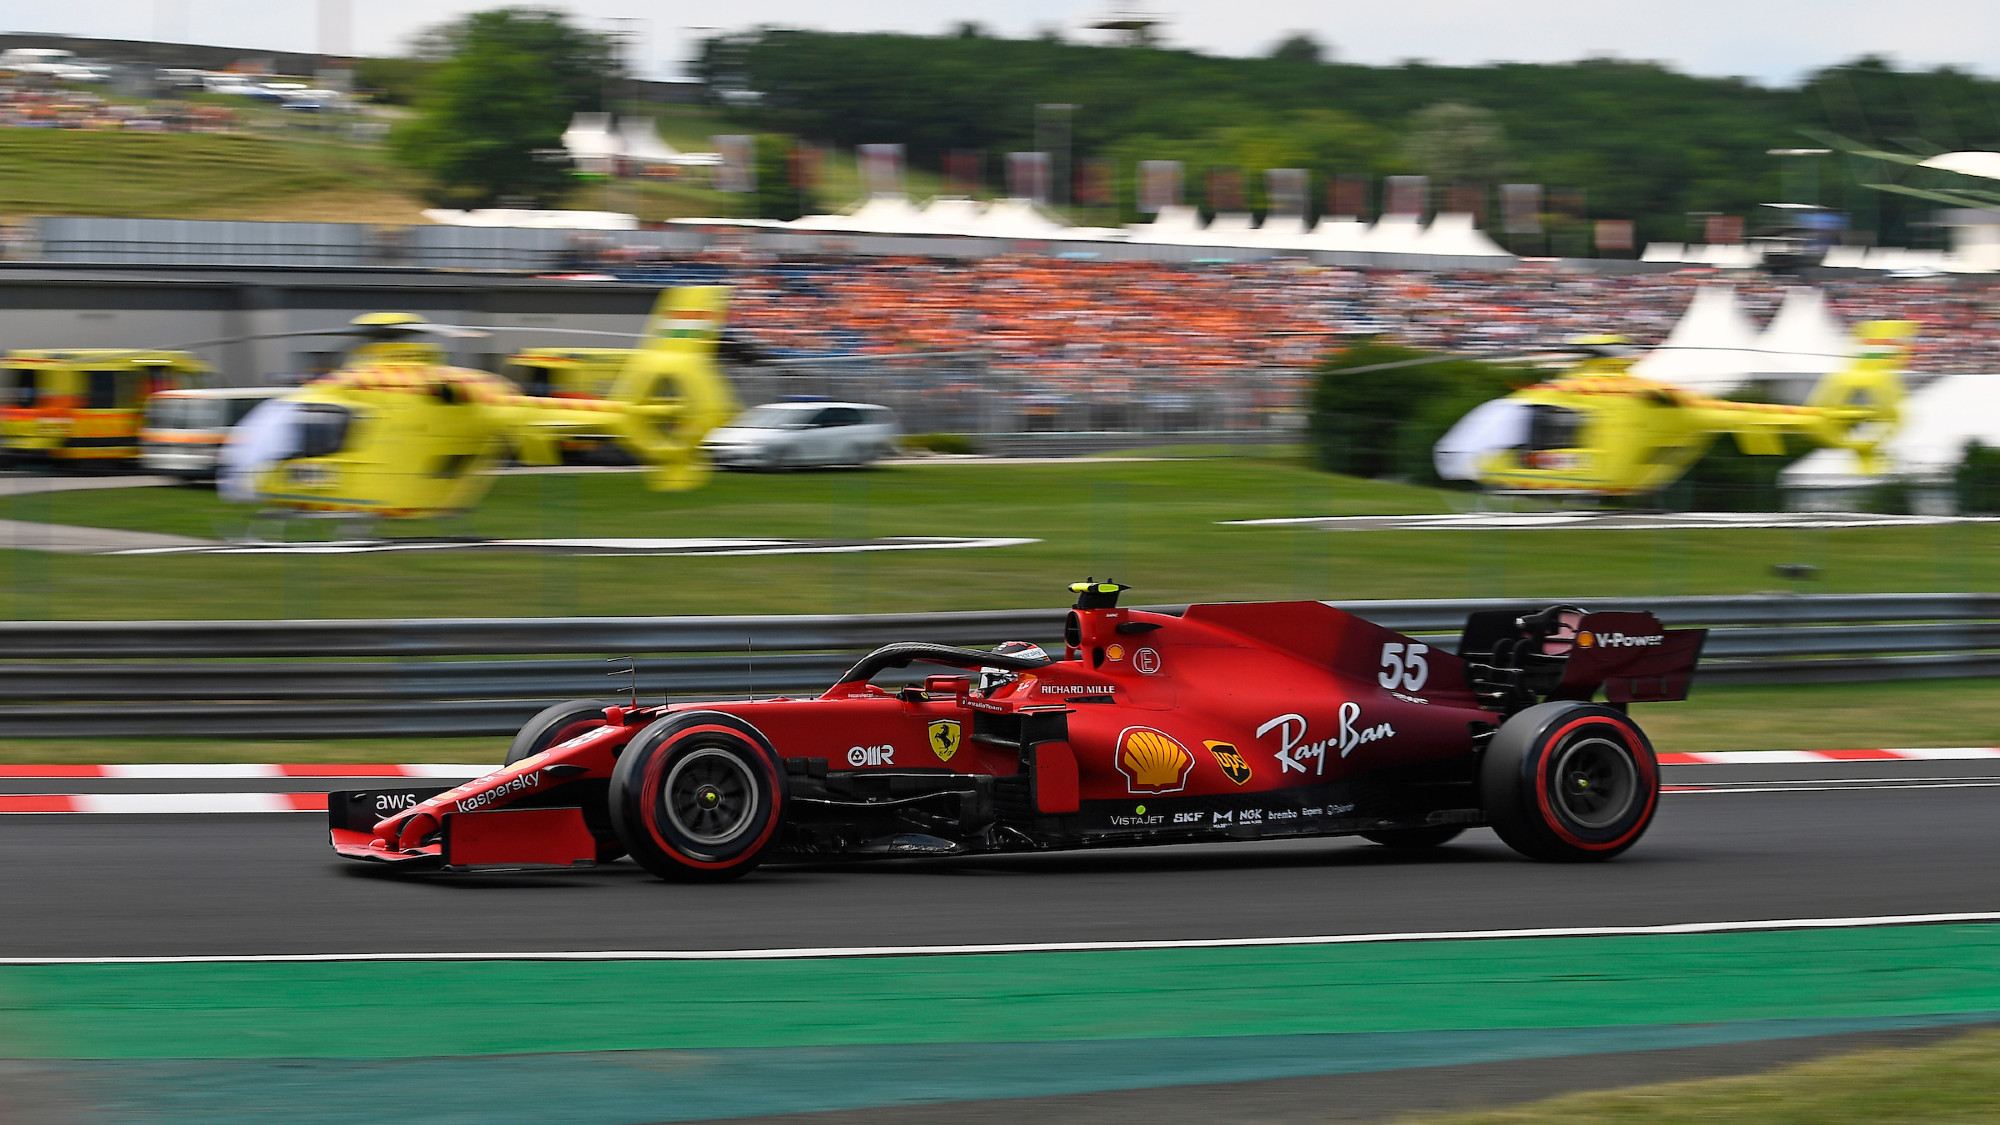 Carlos Sainz, 2021 Hungarian GP